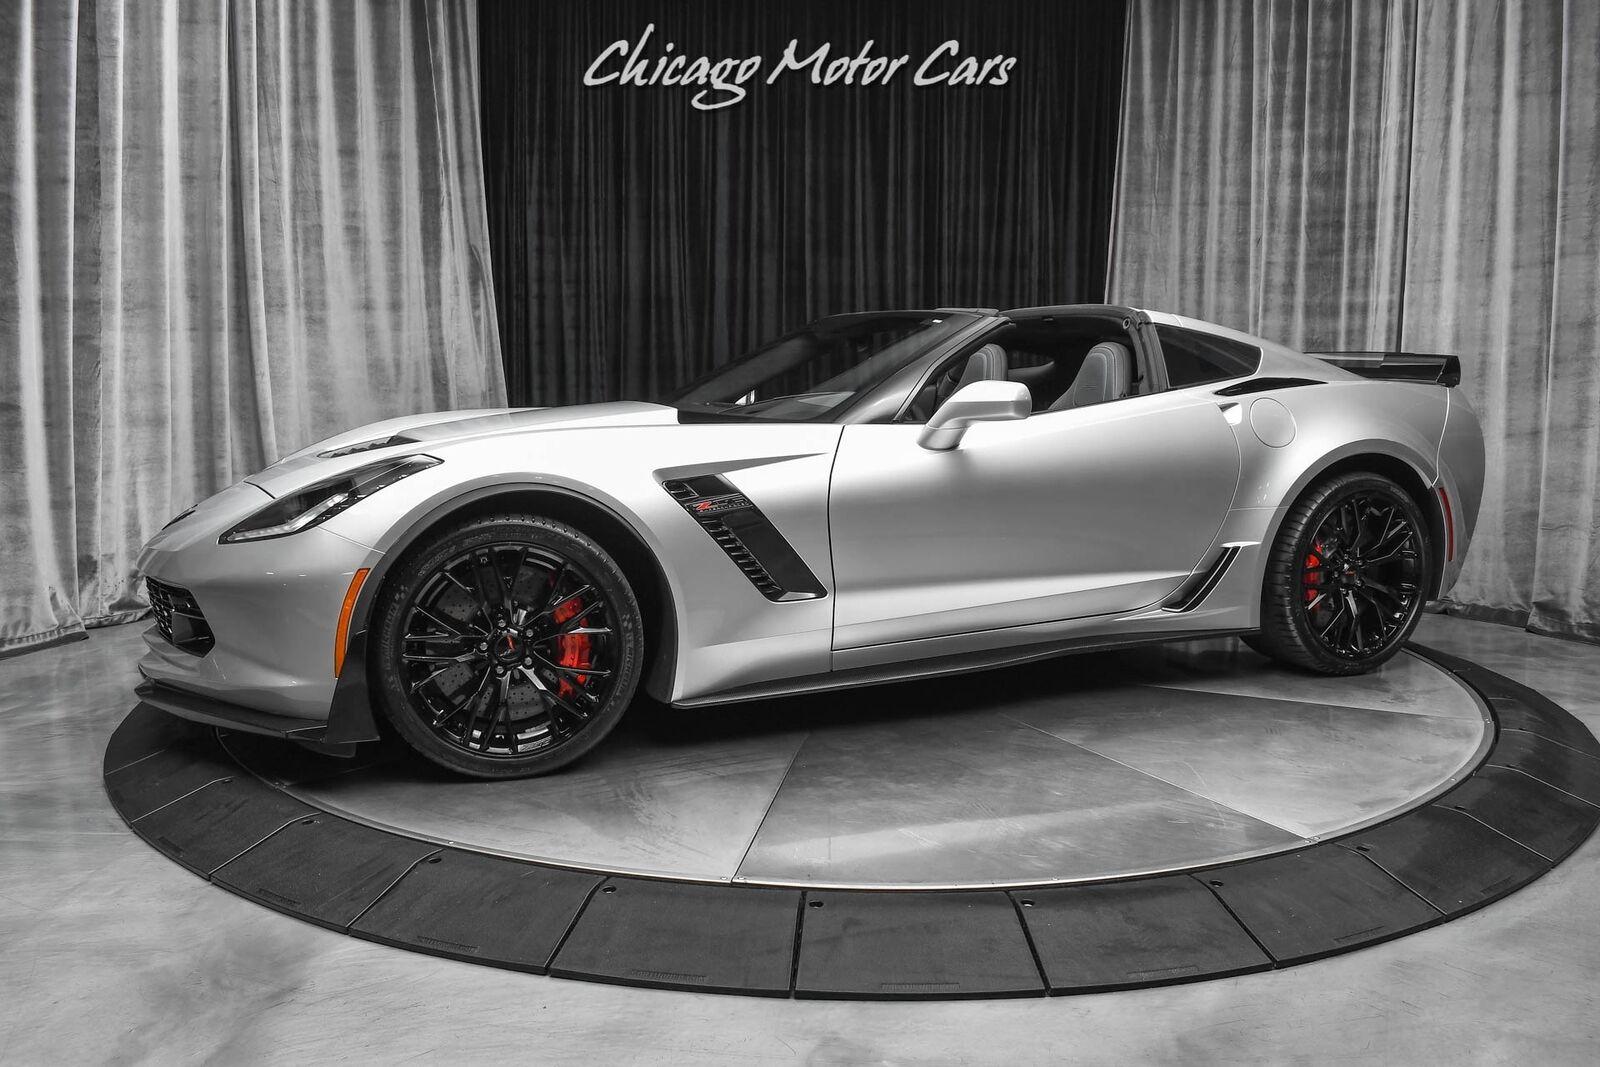 2016 Silver Chevrolet Corvette Z06 3LZ   C7 Corvette Photo 1